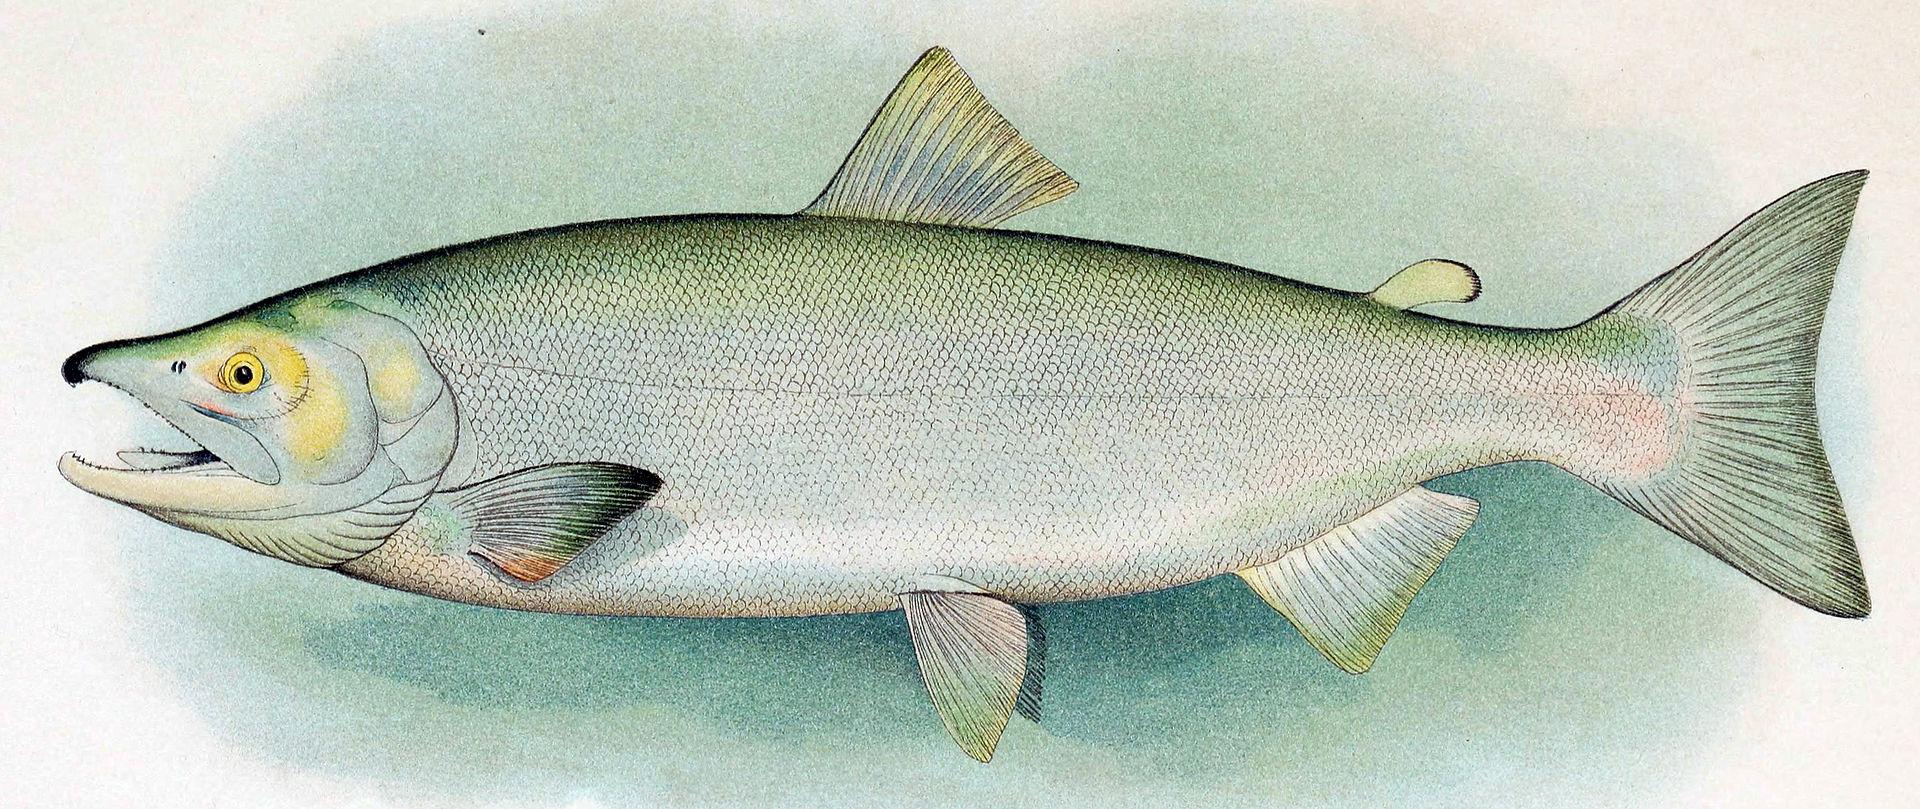 how to prepare sockeye salmon